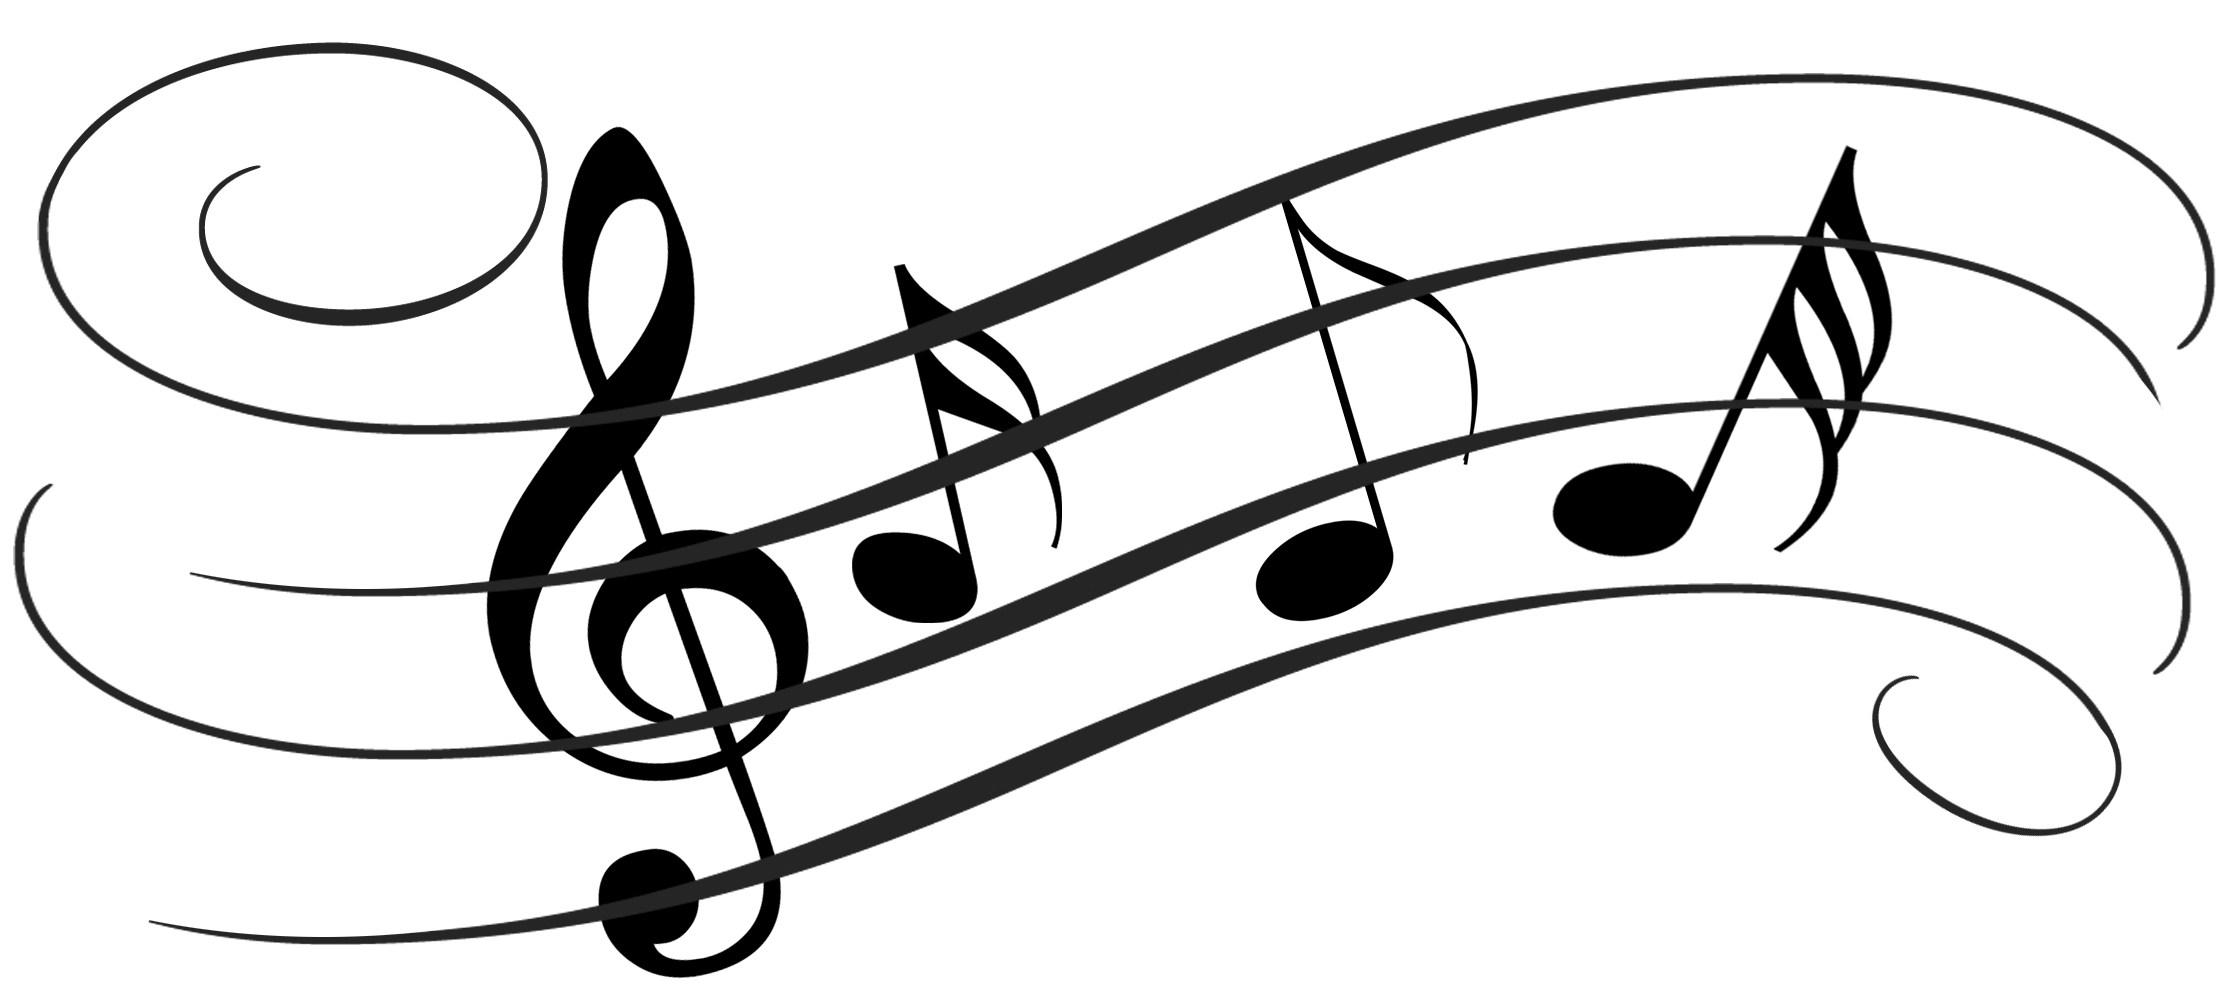 2236x1006 Christmas Music Notes Border Singing 8355 1